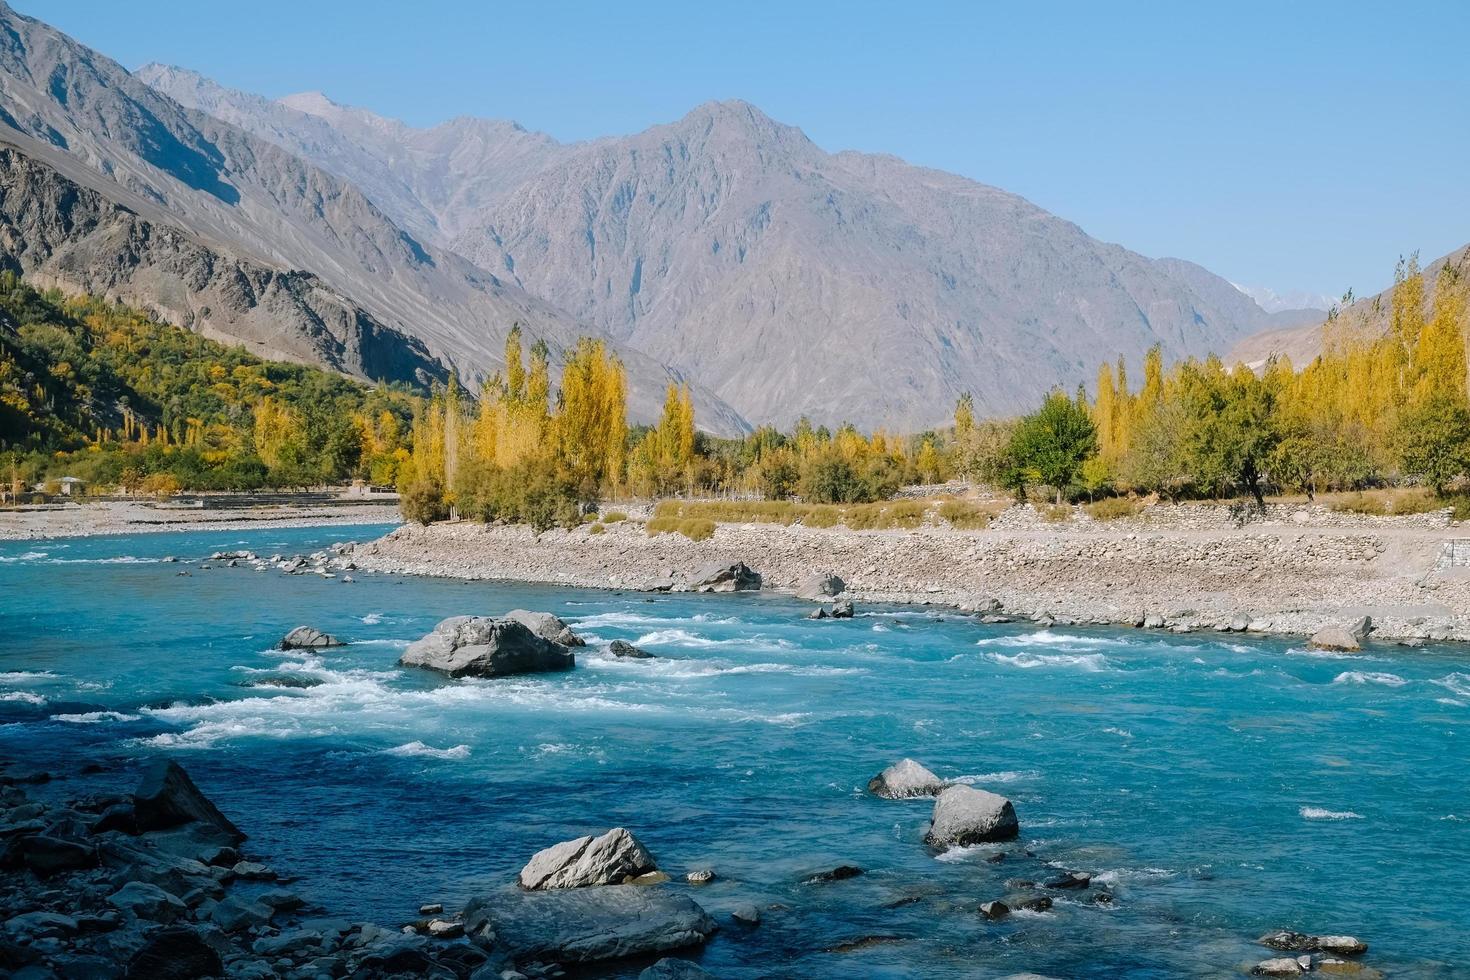 río azul turquesa foto